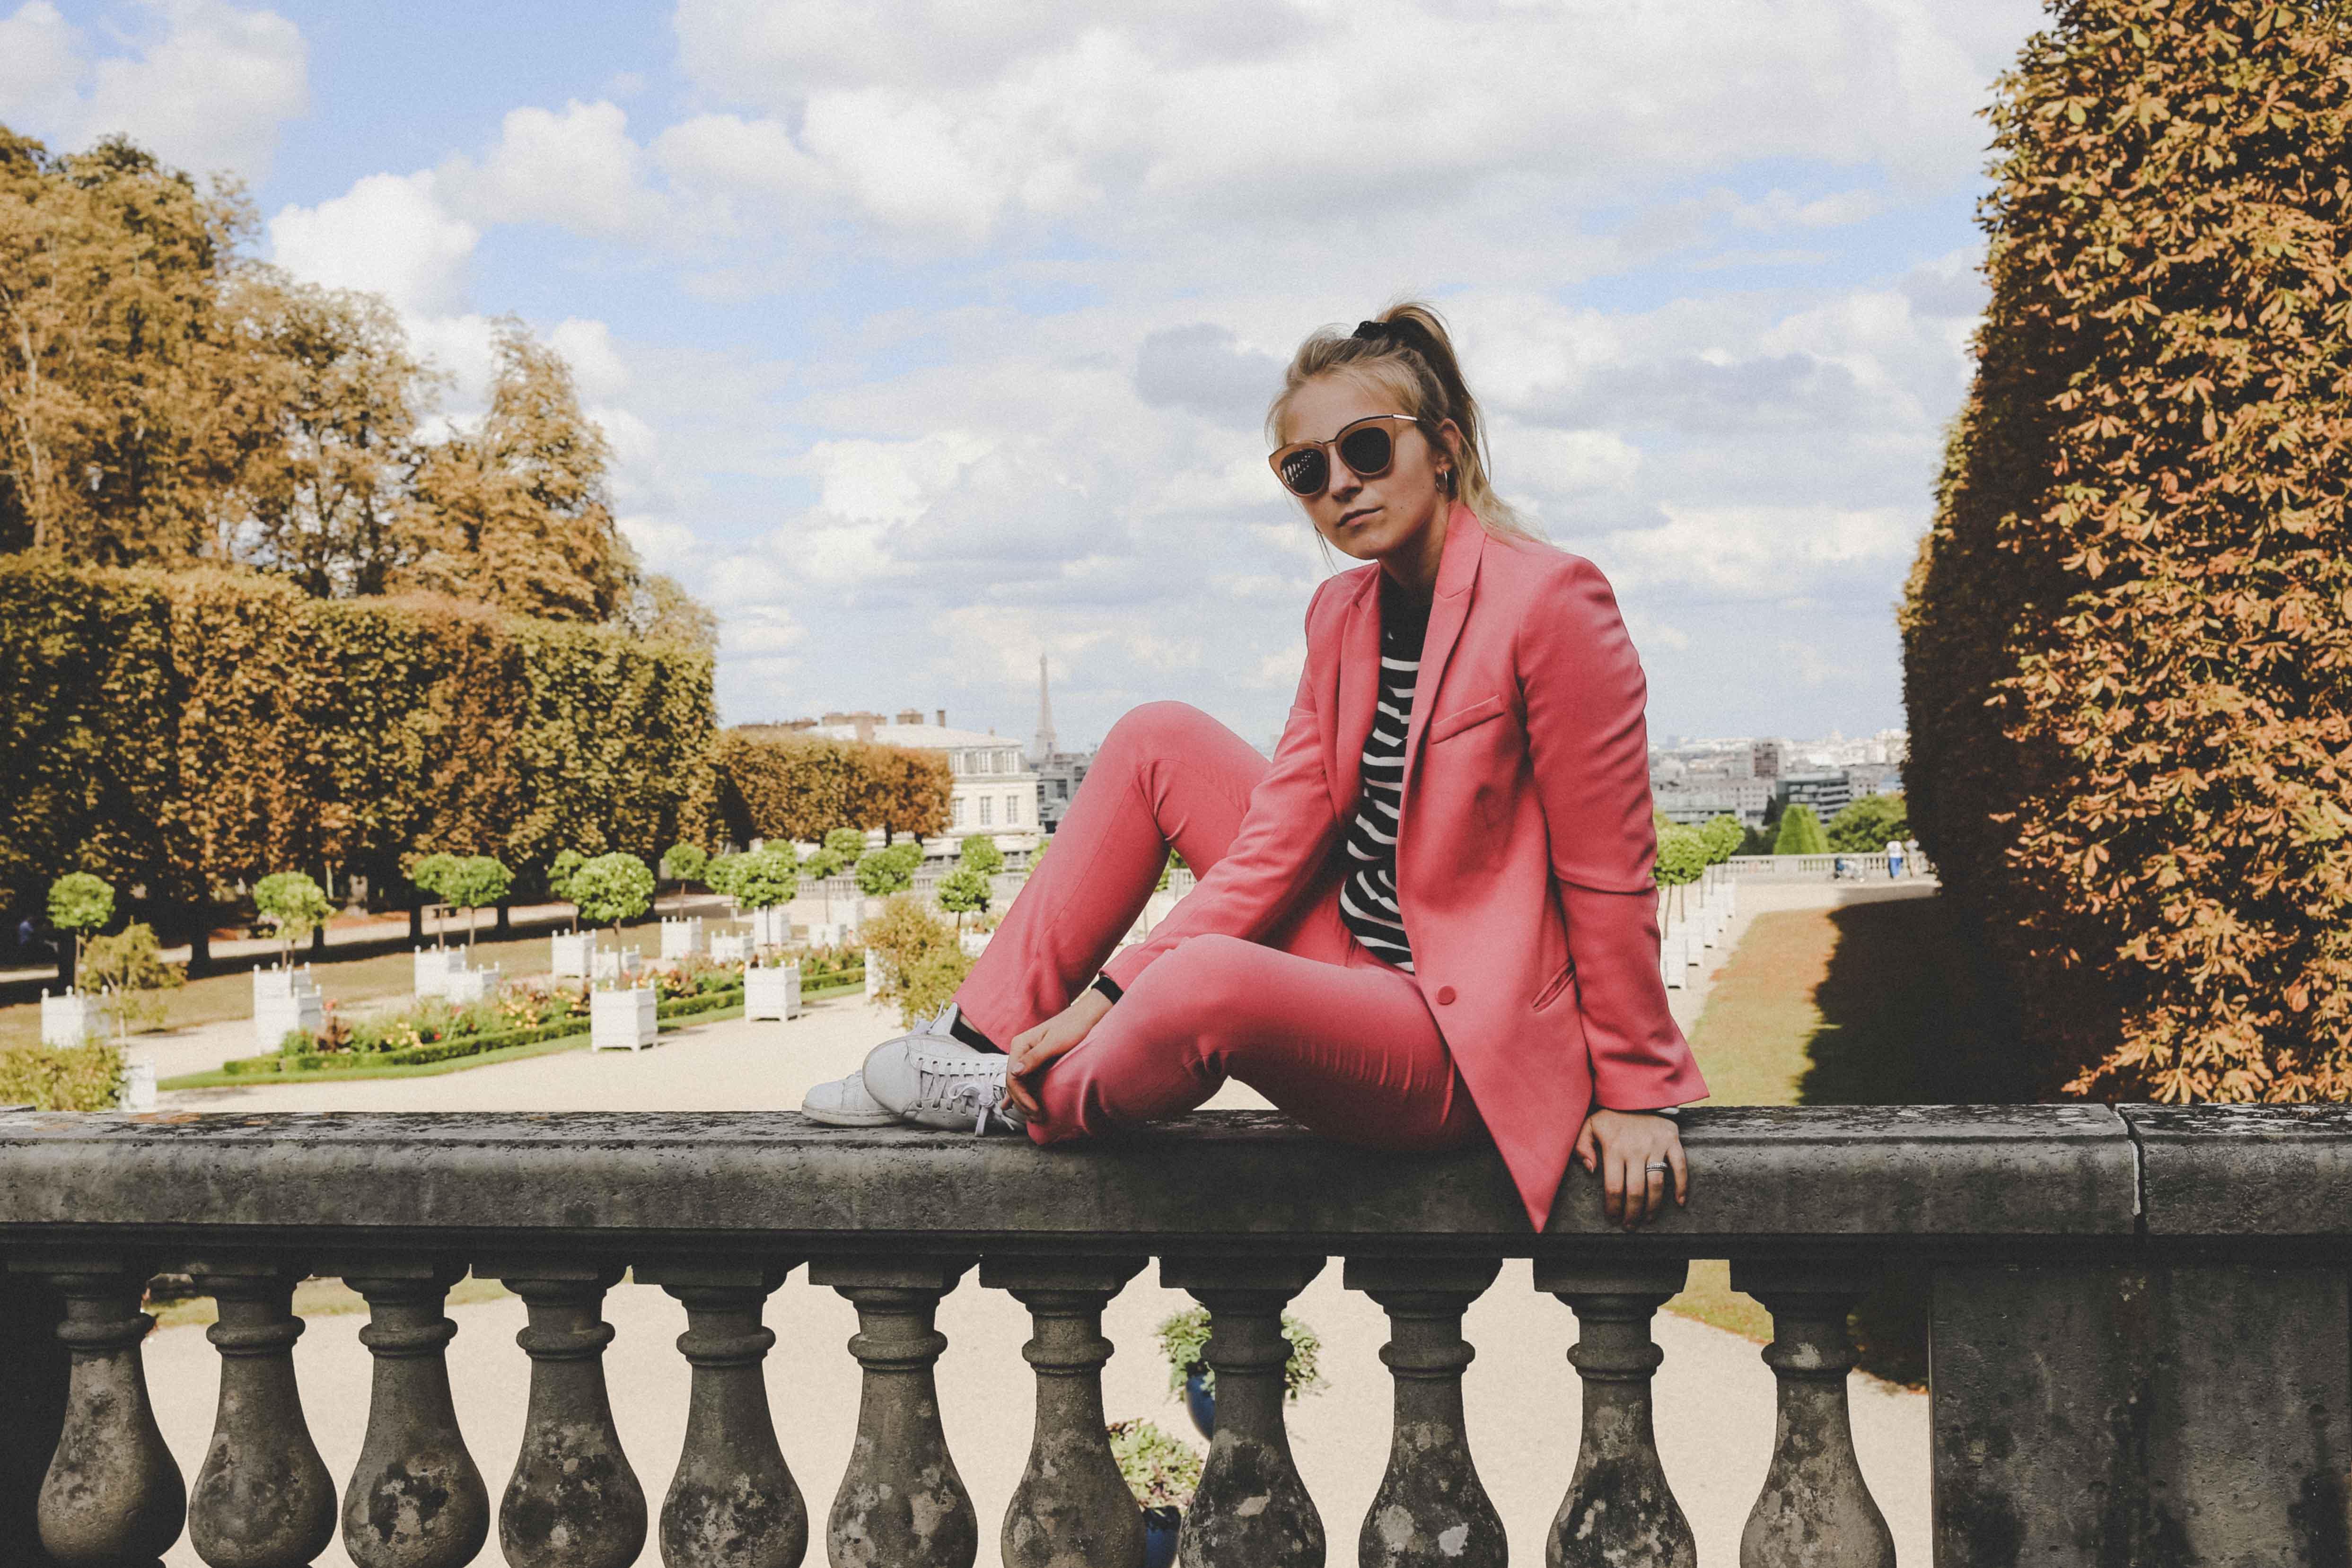 trendreport-pinker-hosenanzug-pink-suit-how-to-paris-fashionblog-modeblog-outfit_1847